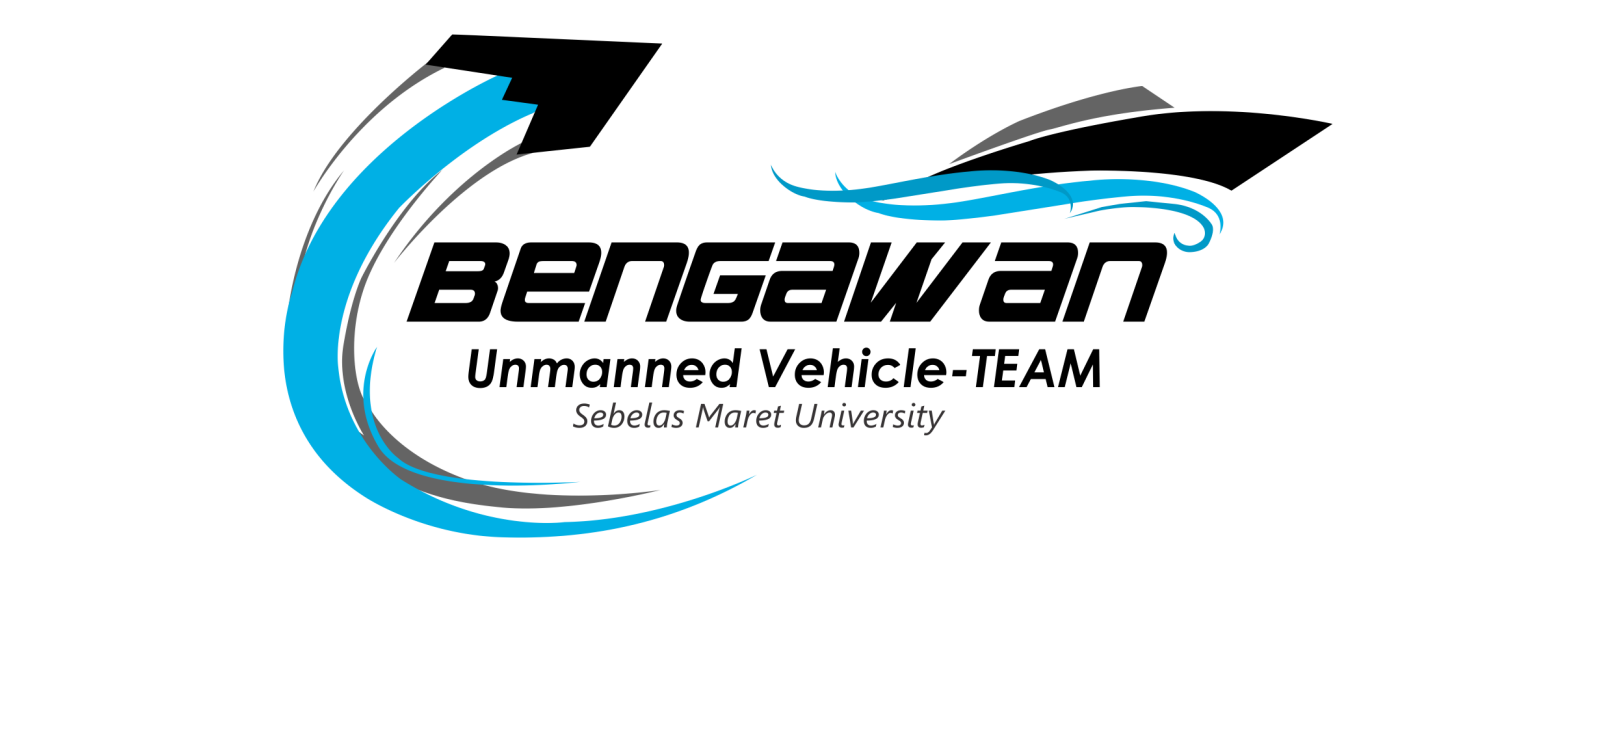 #10 Sebelas Maret University